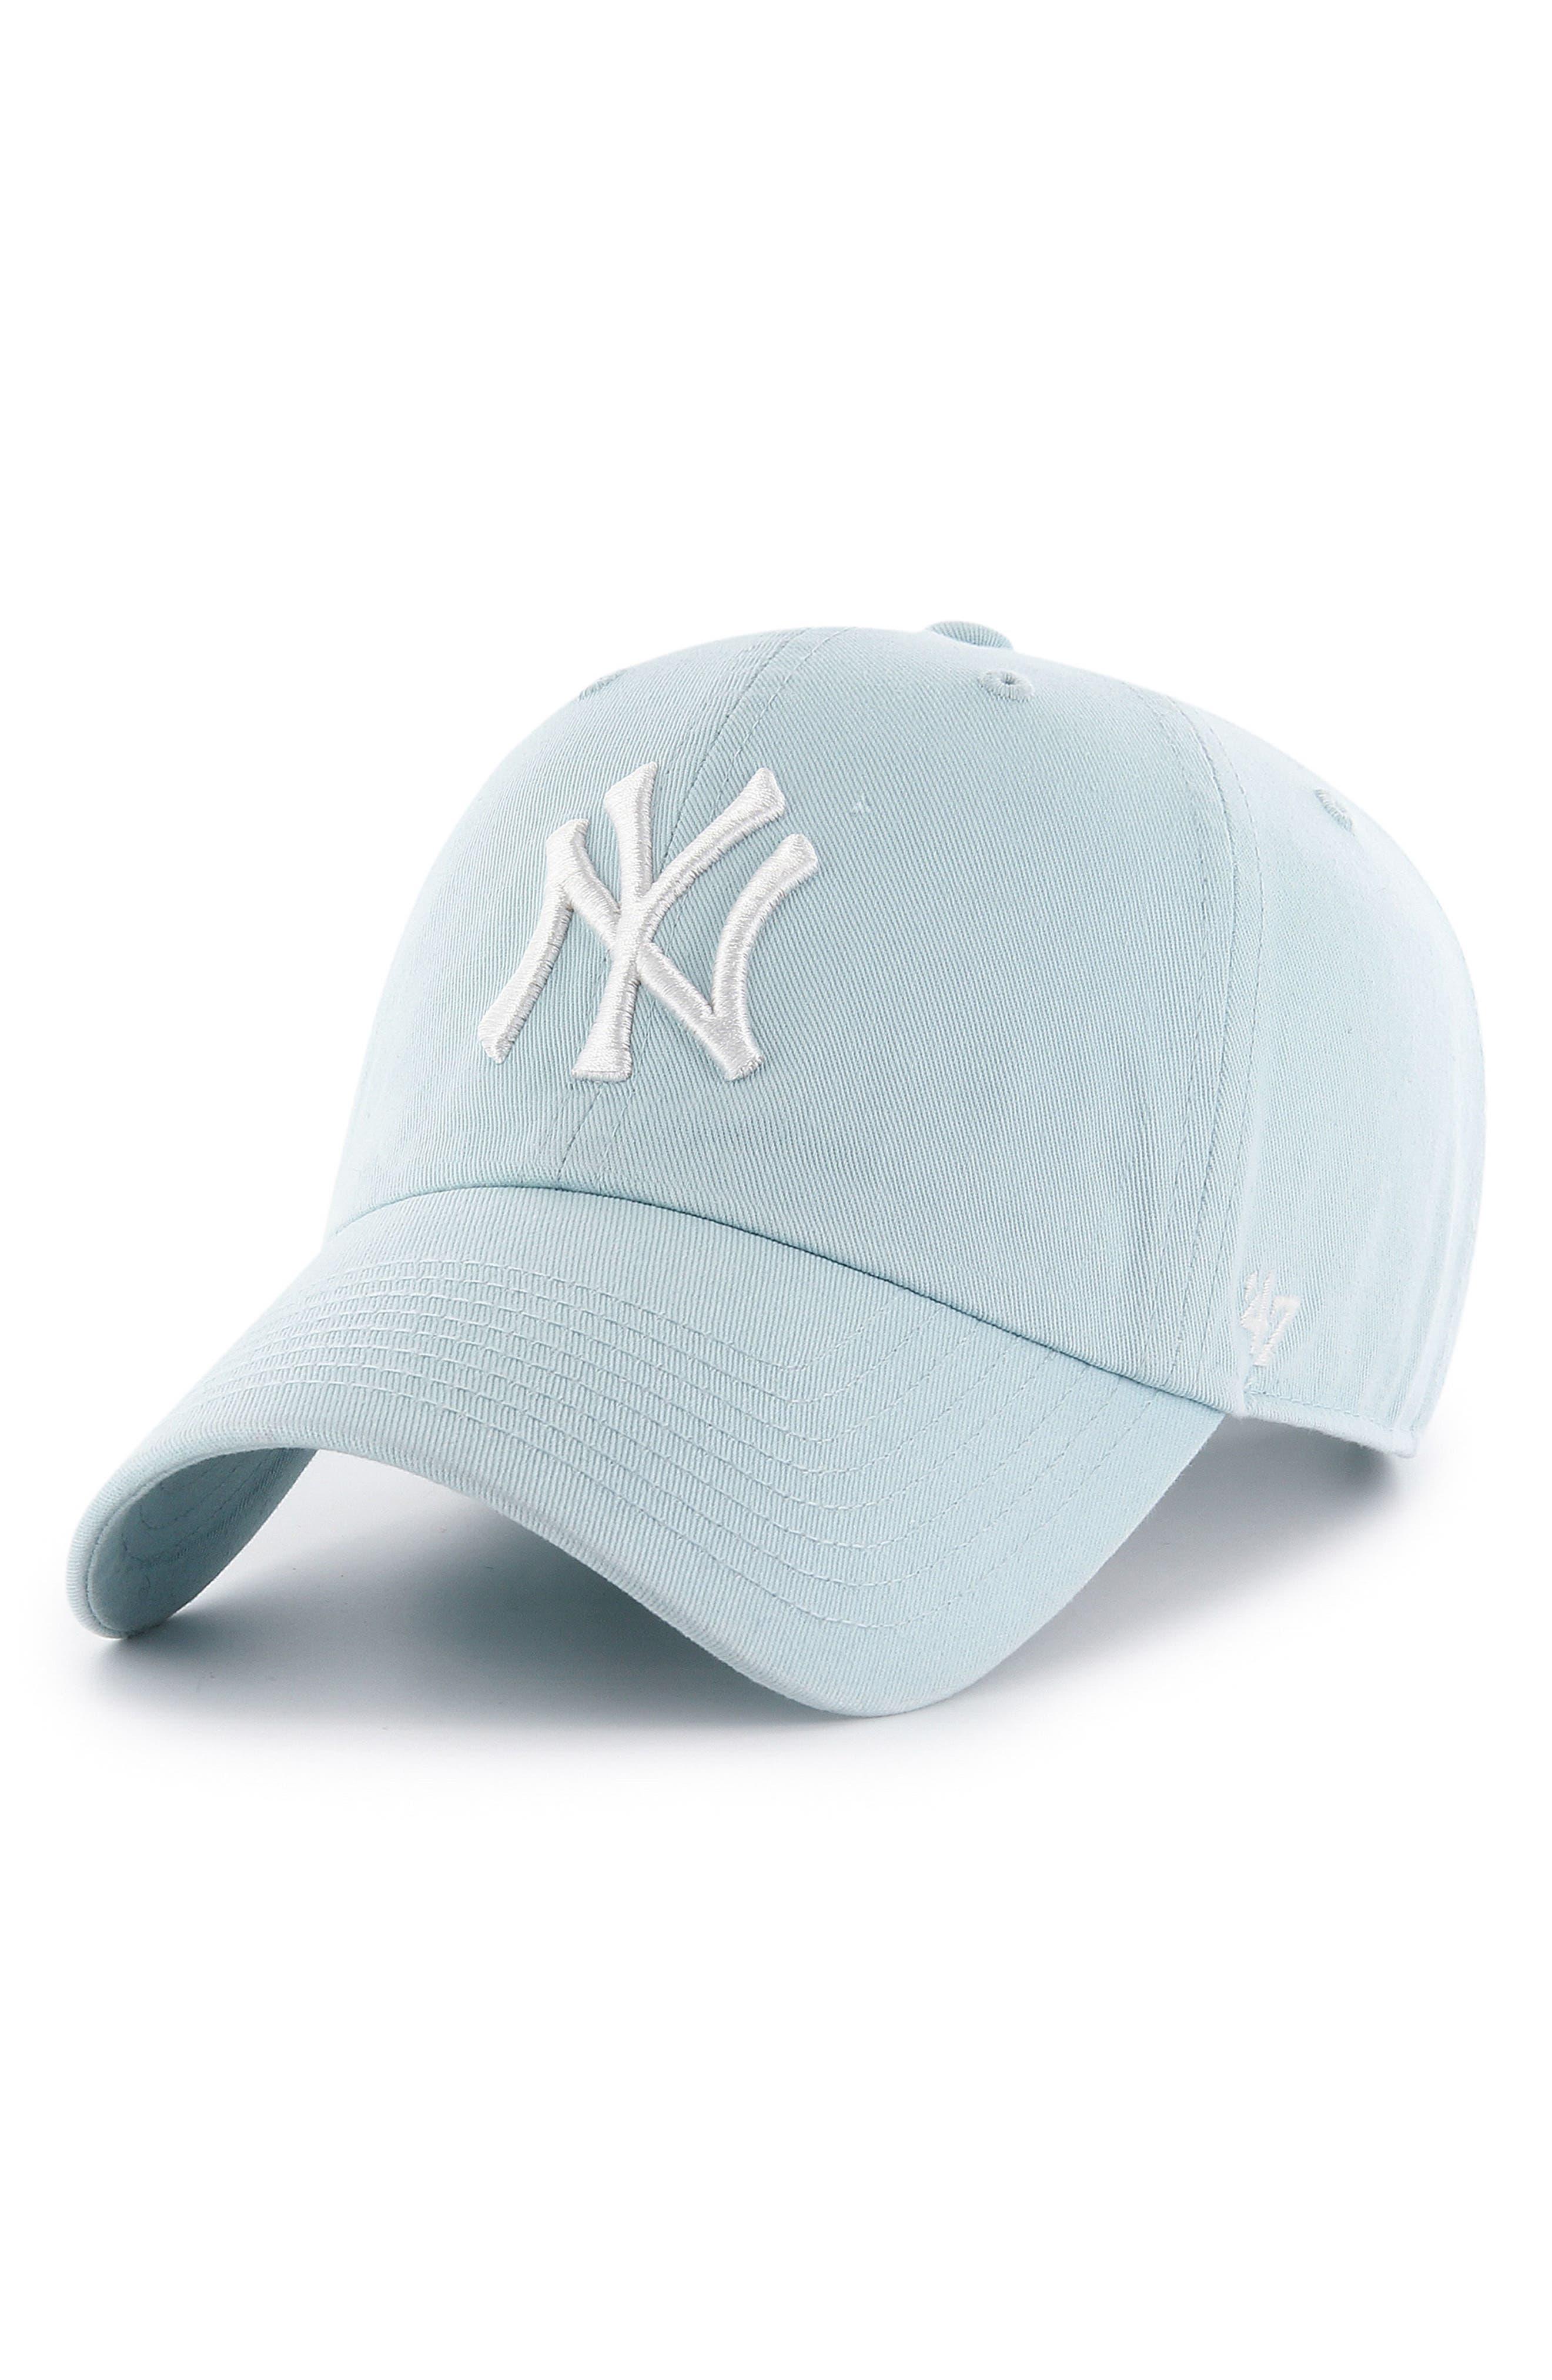 47 NY Yankees Baseball Cap